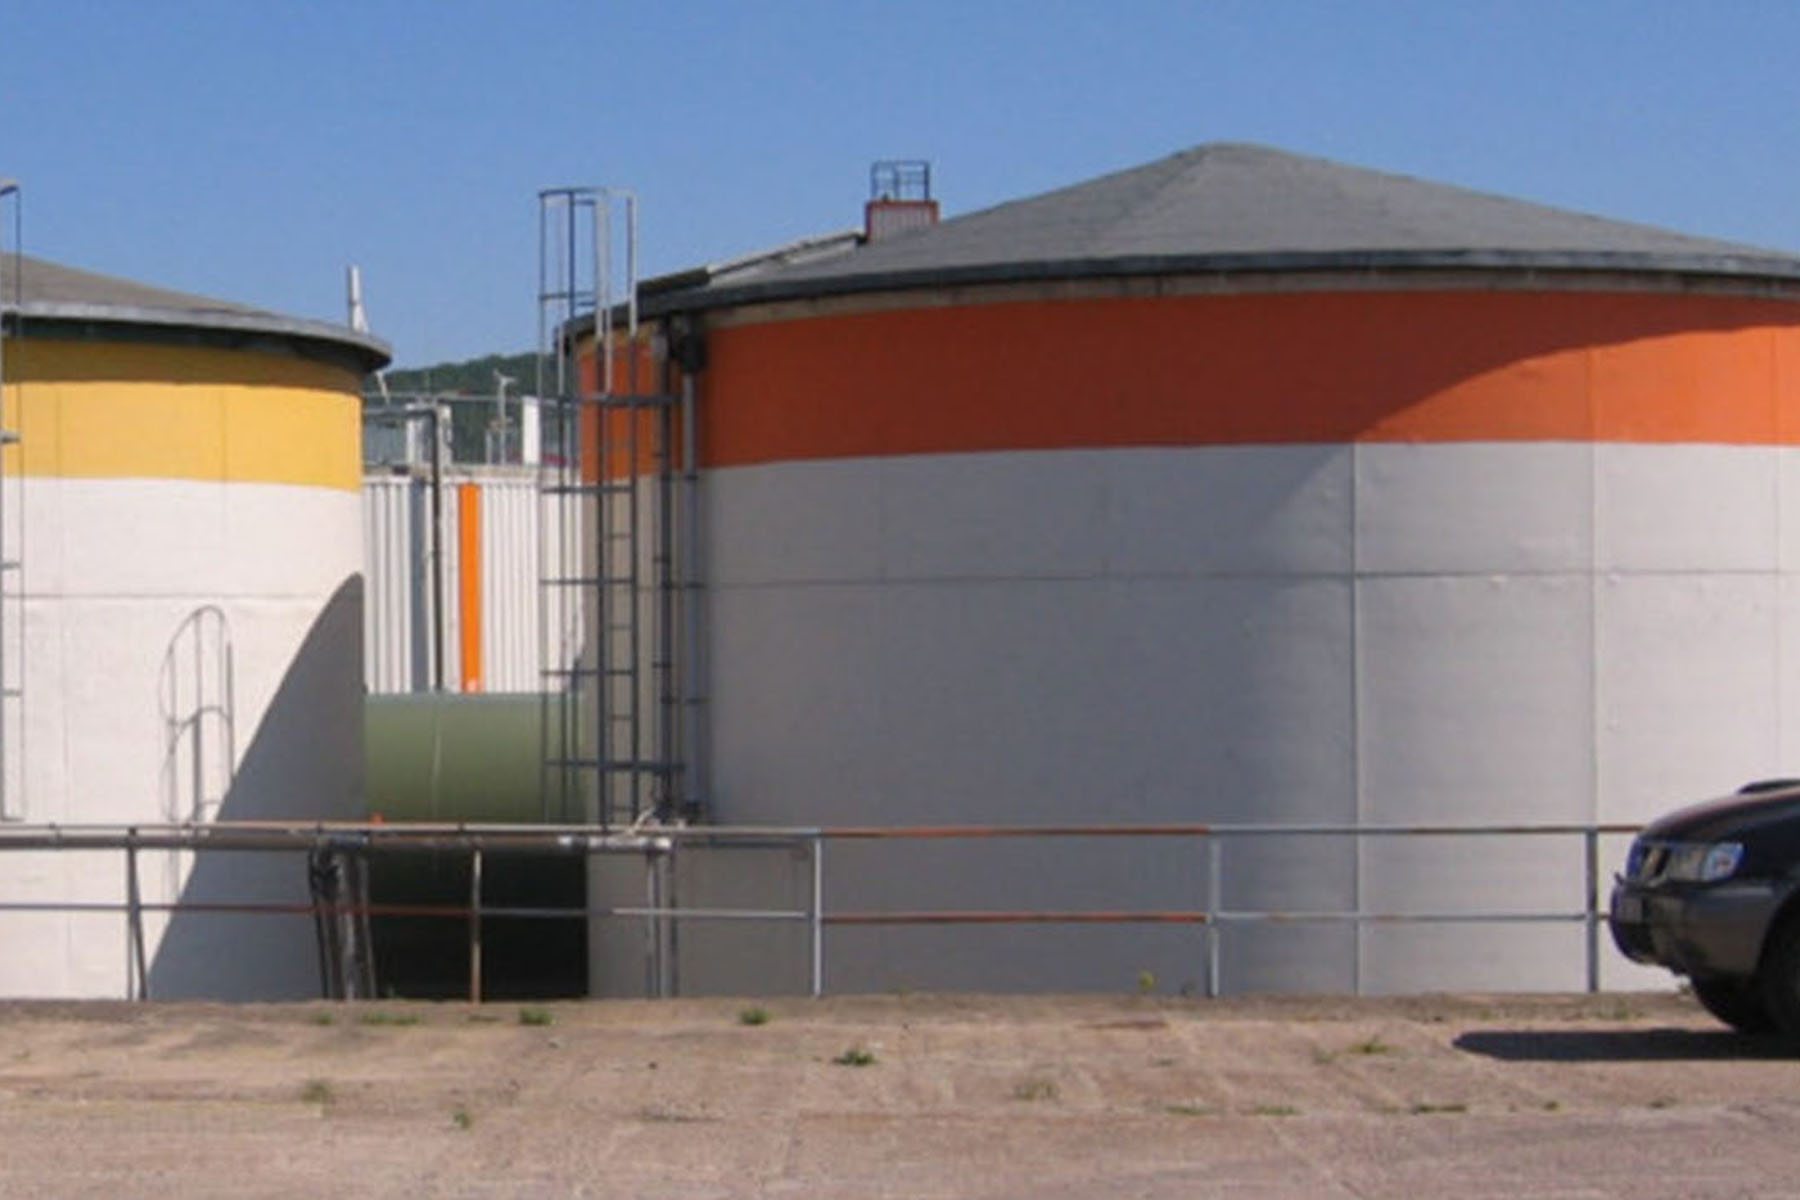 Flüssigdüngerbehälter